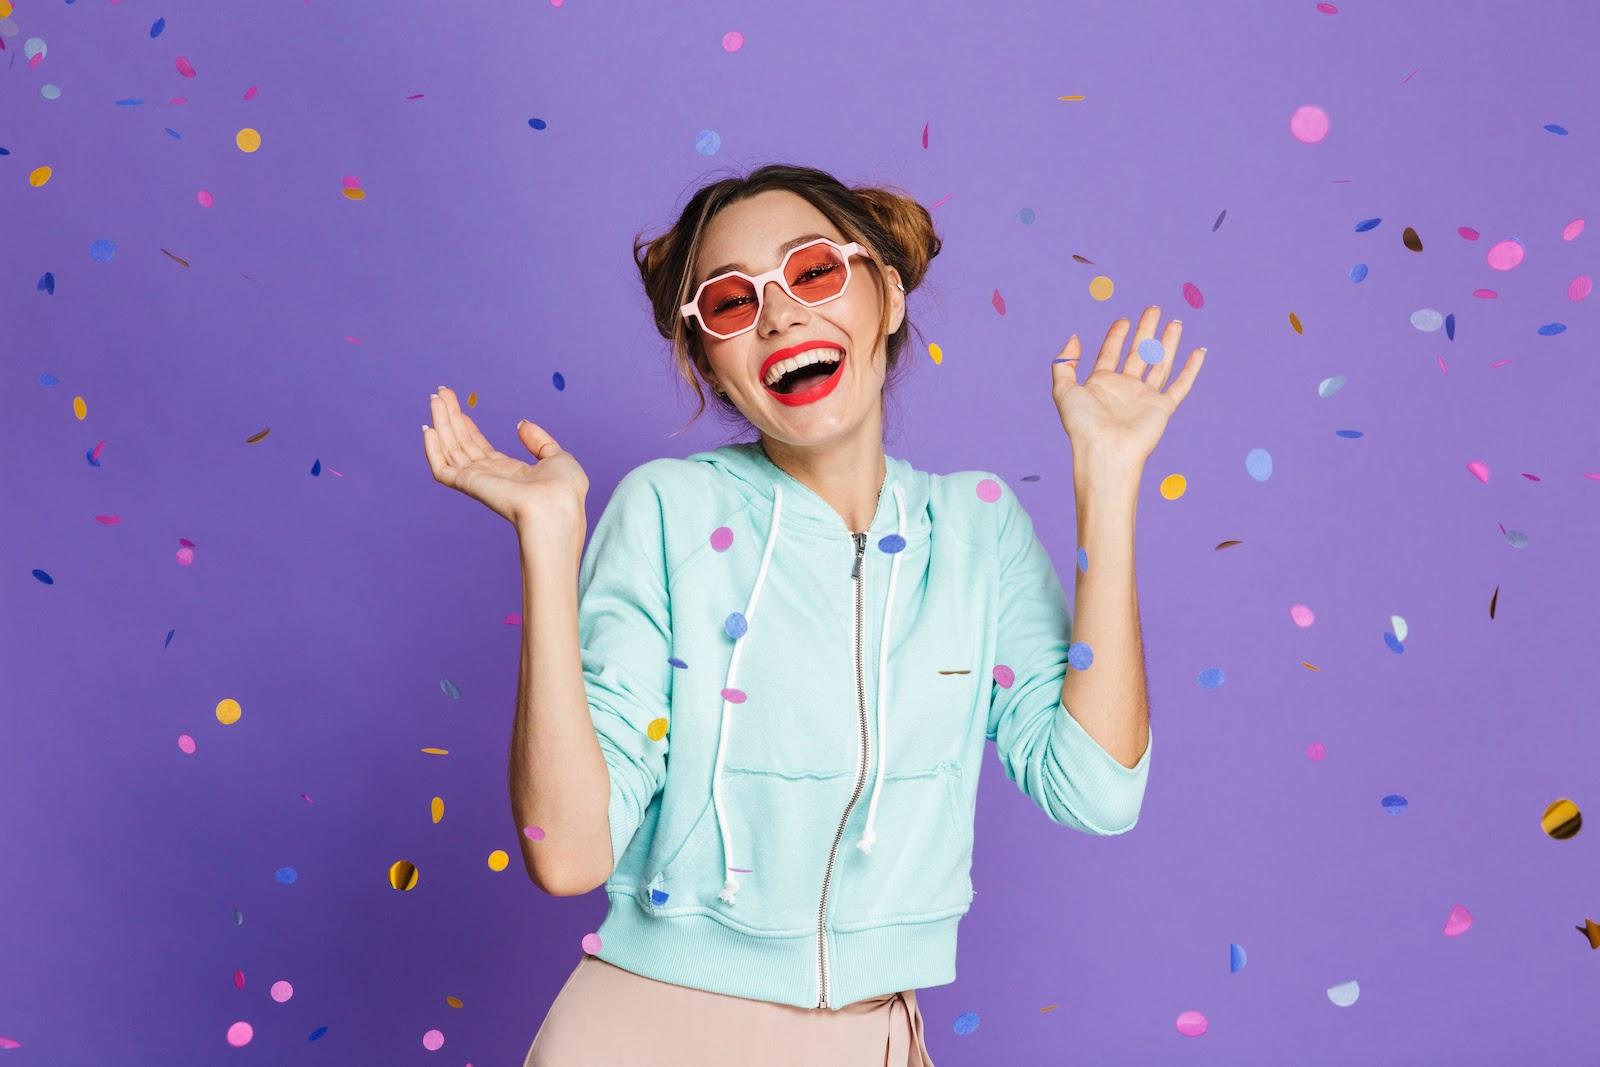 A happy team member throws confetti